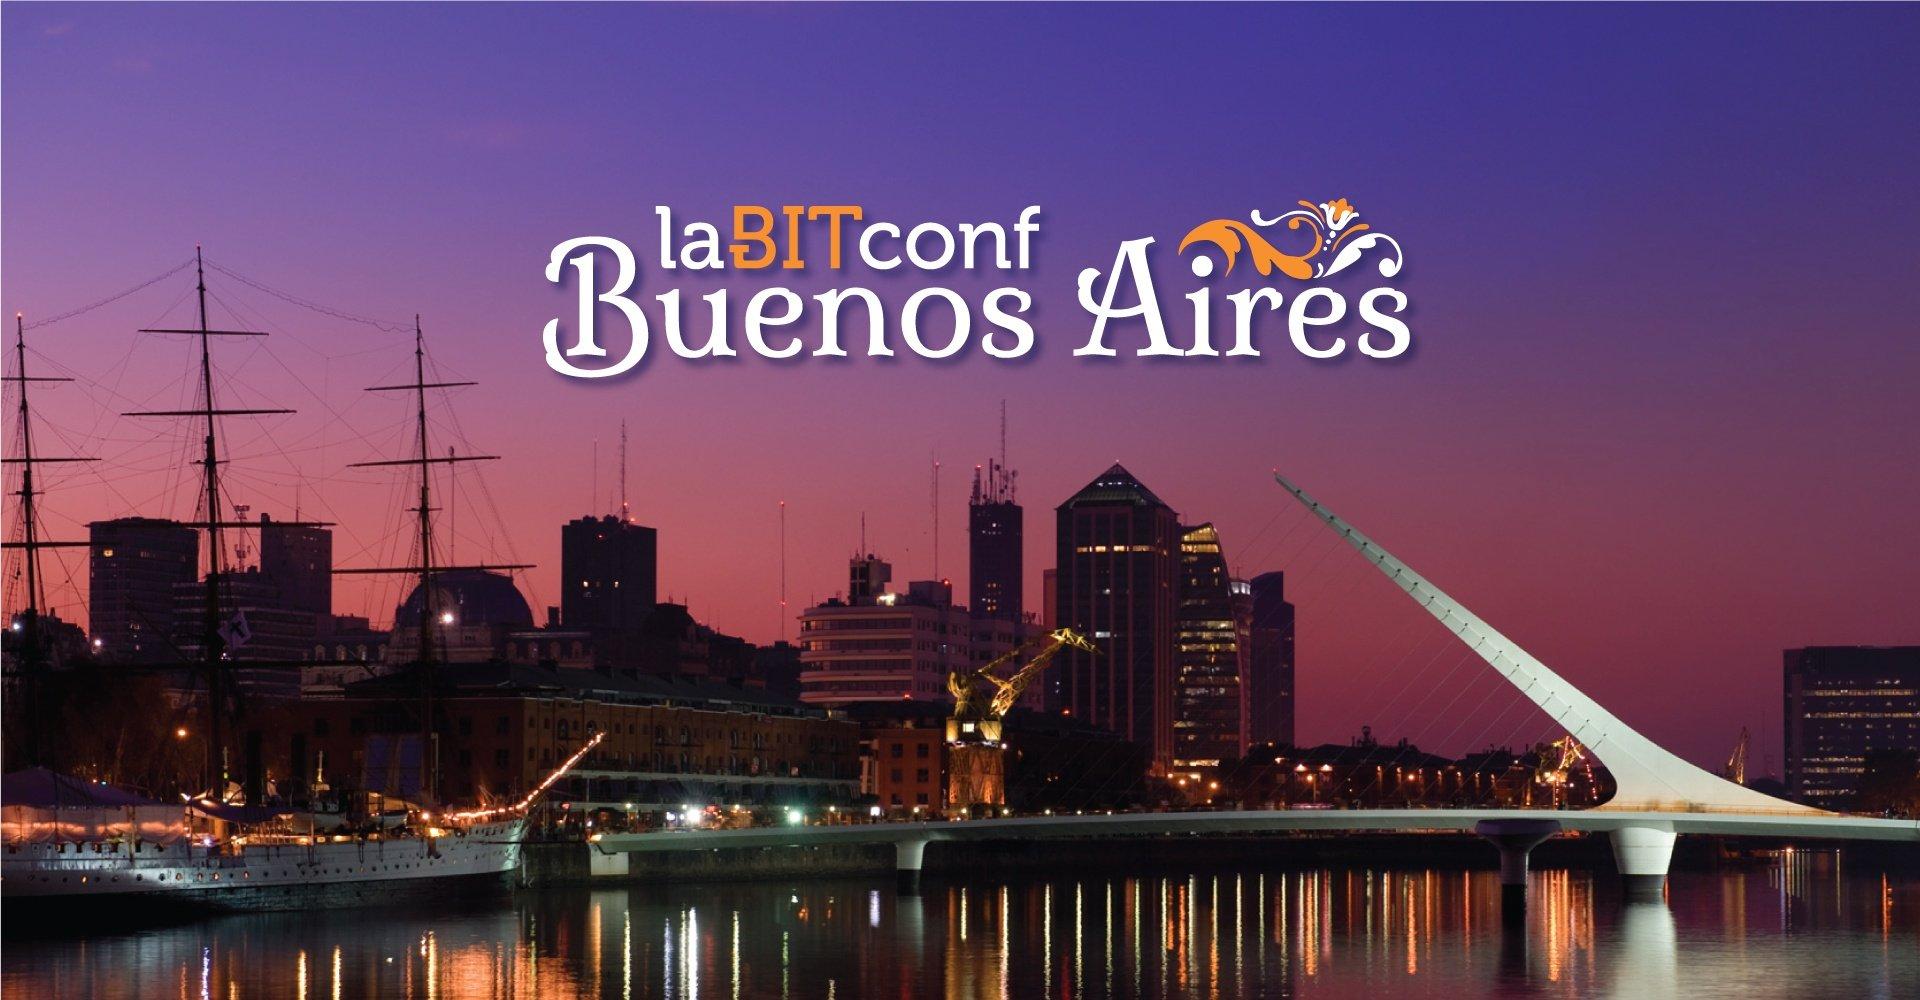 labitconf jaxx rootstock buenos aires argentina labitcoinf